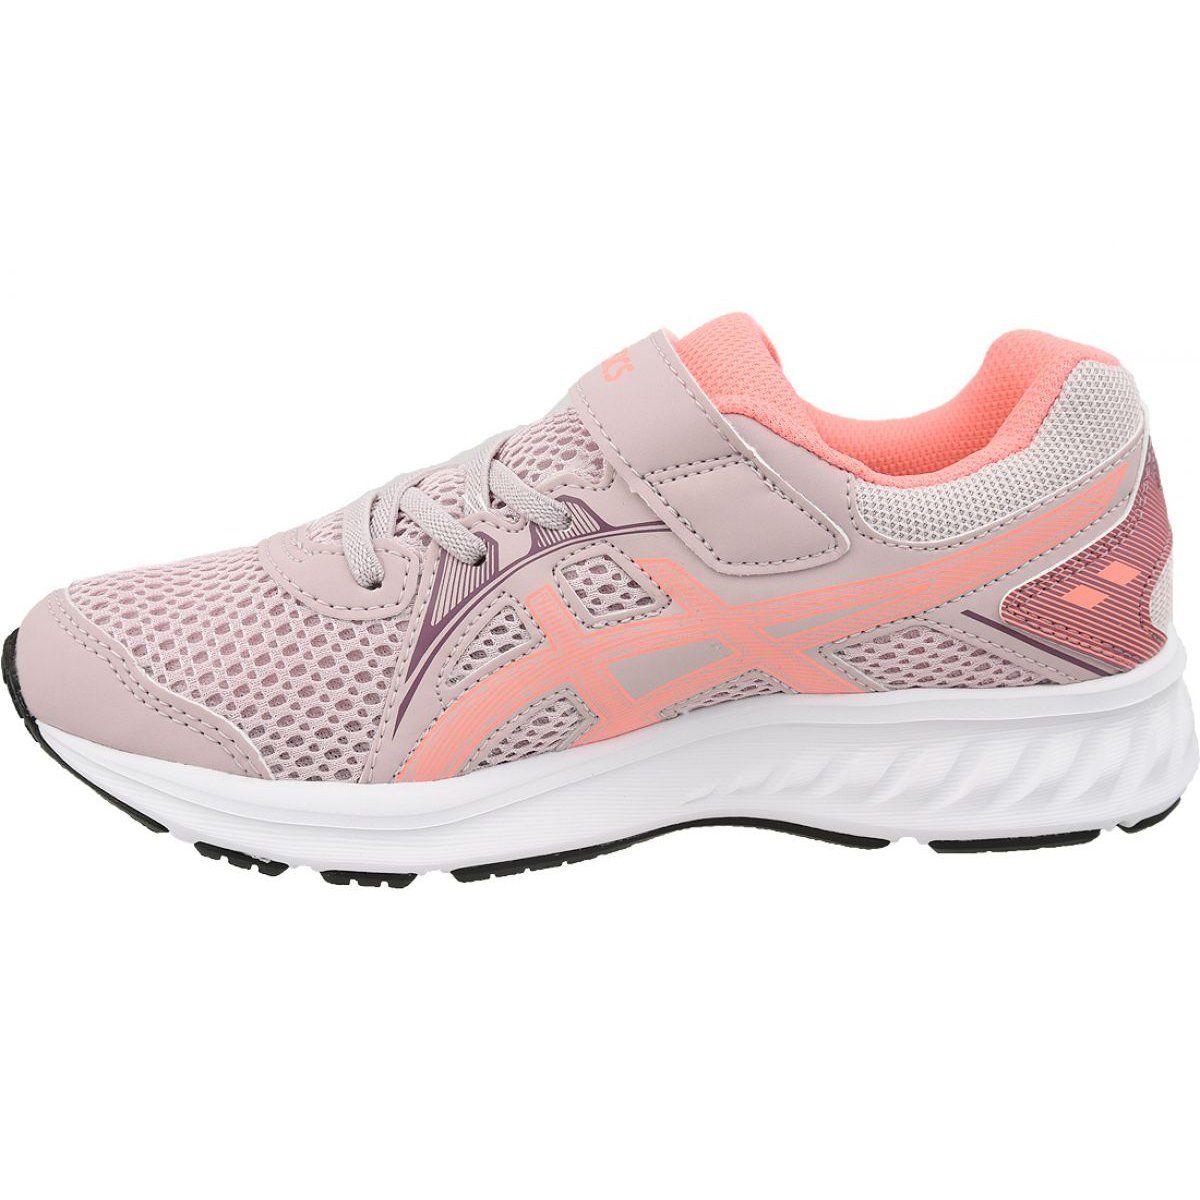 Buty Asics Jolt 2 Ps Jr 1014a034 701 Rozowe Asics Brooks Sneaker Shoes